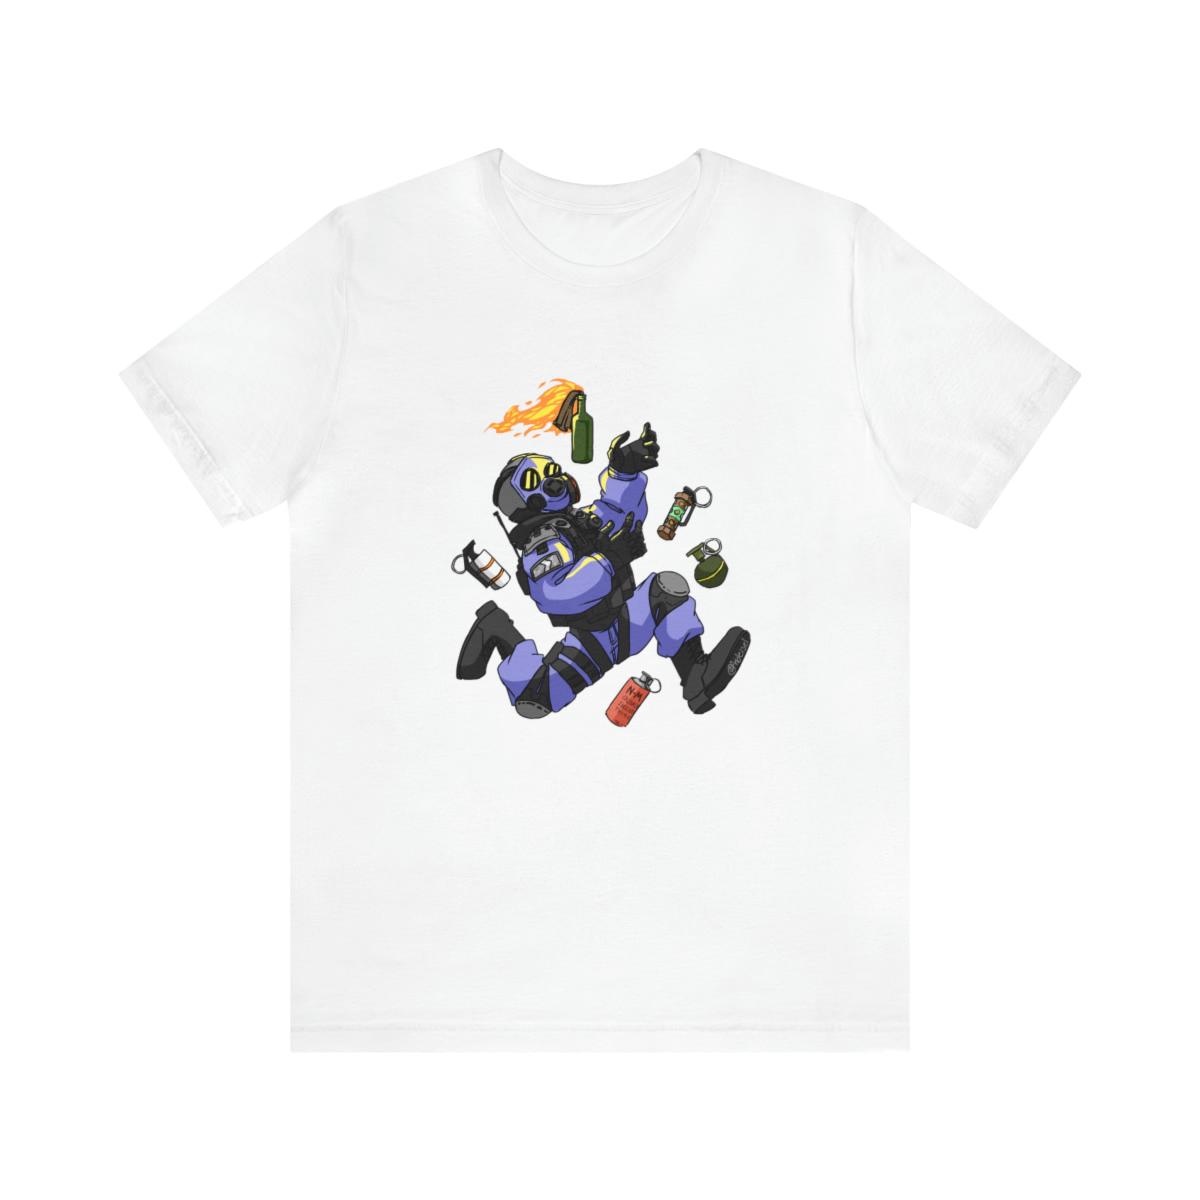 Tony Nades Shirt